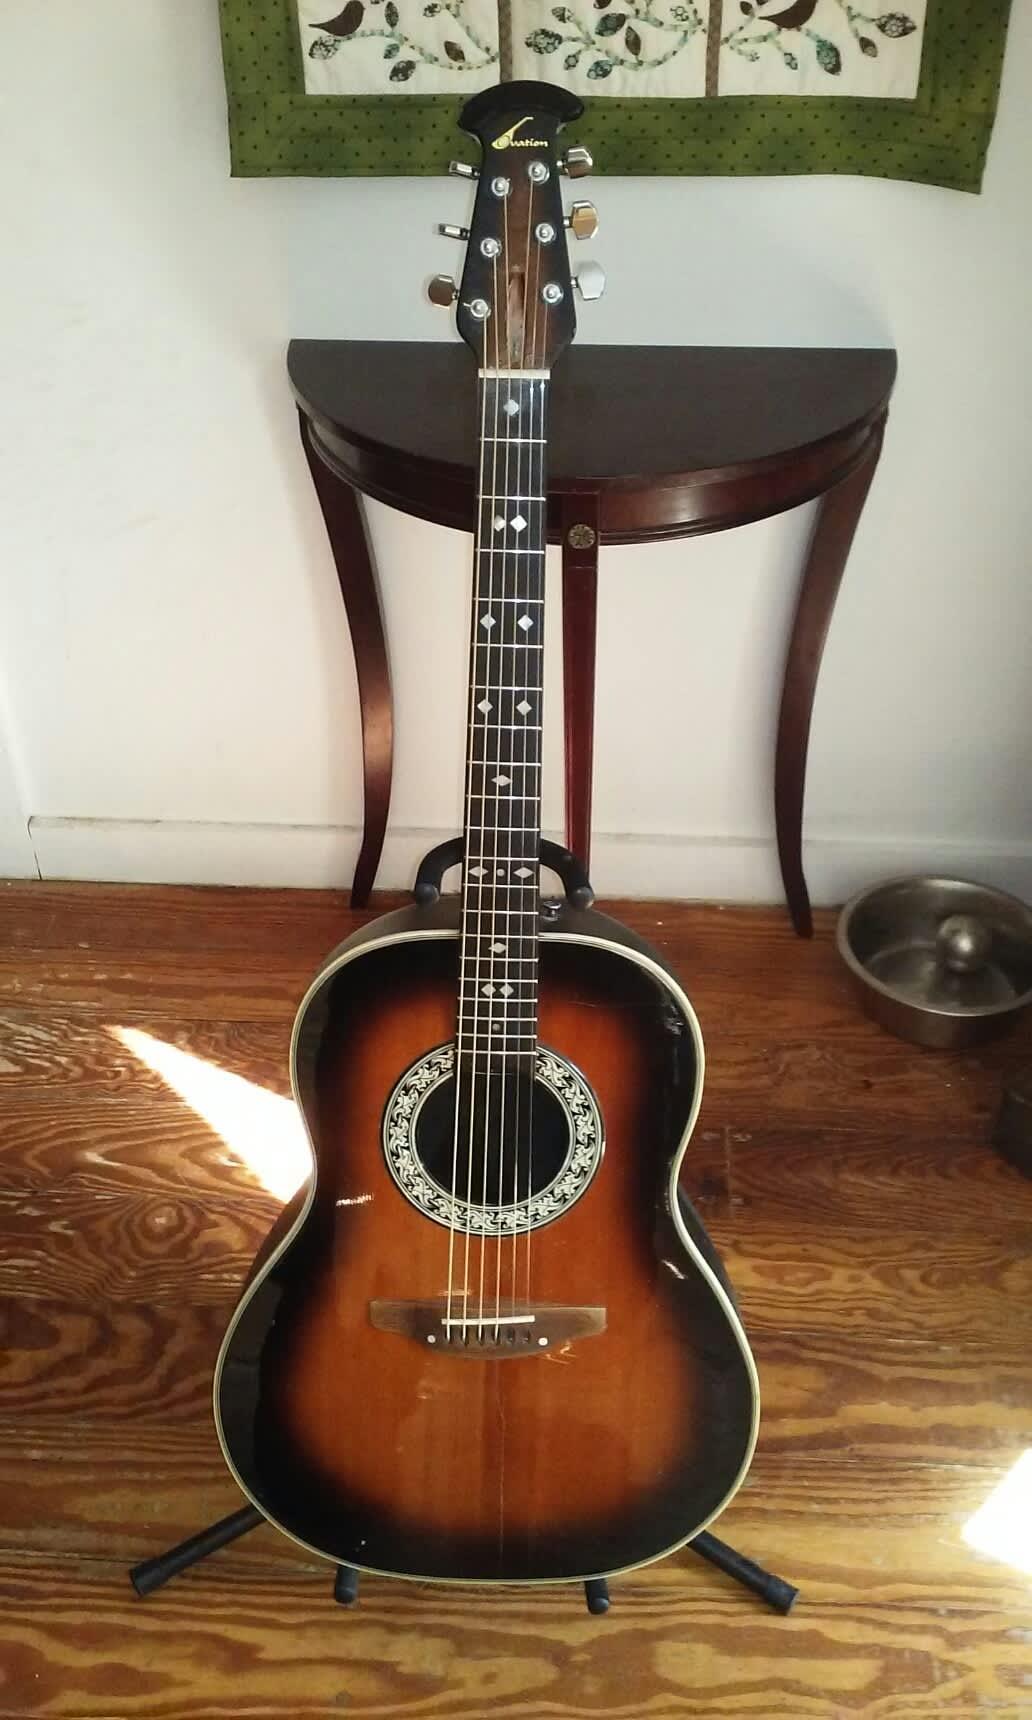 1977 ovation 1112 custom balladeer acoustic guitar 79 bucks reverb. Black Bedroom Furniture Sets. Home Design Ideas